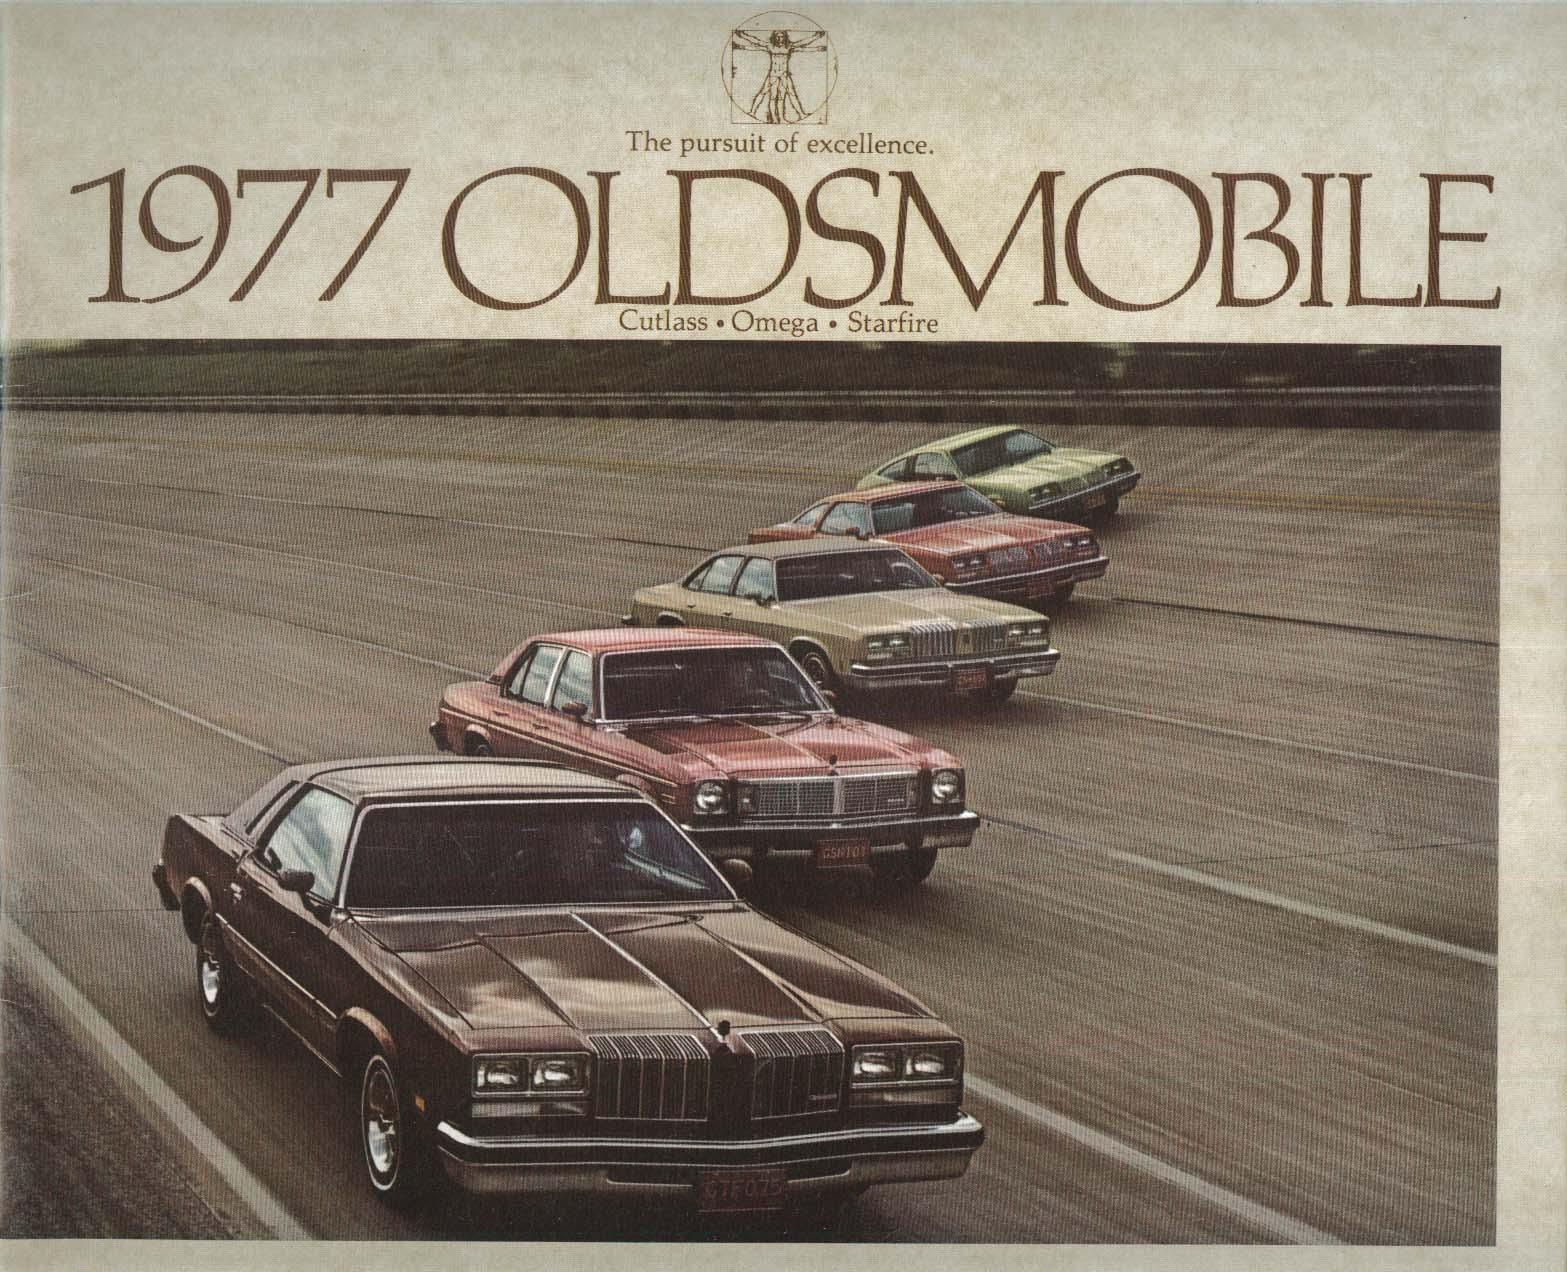 1977 Oldsmobile Cutlass Omega Starfire brochure